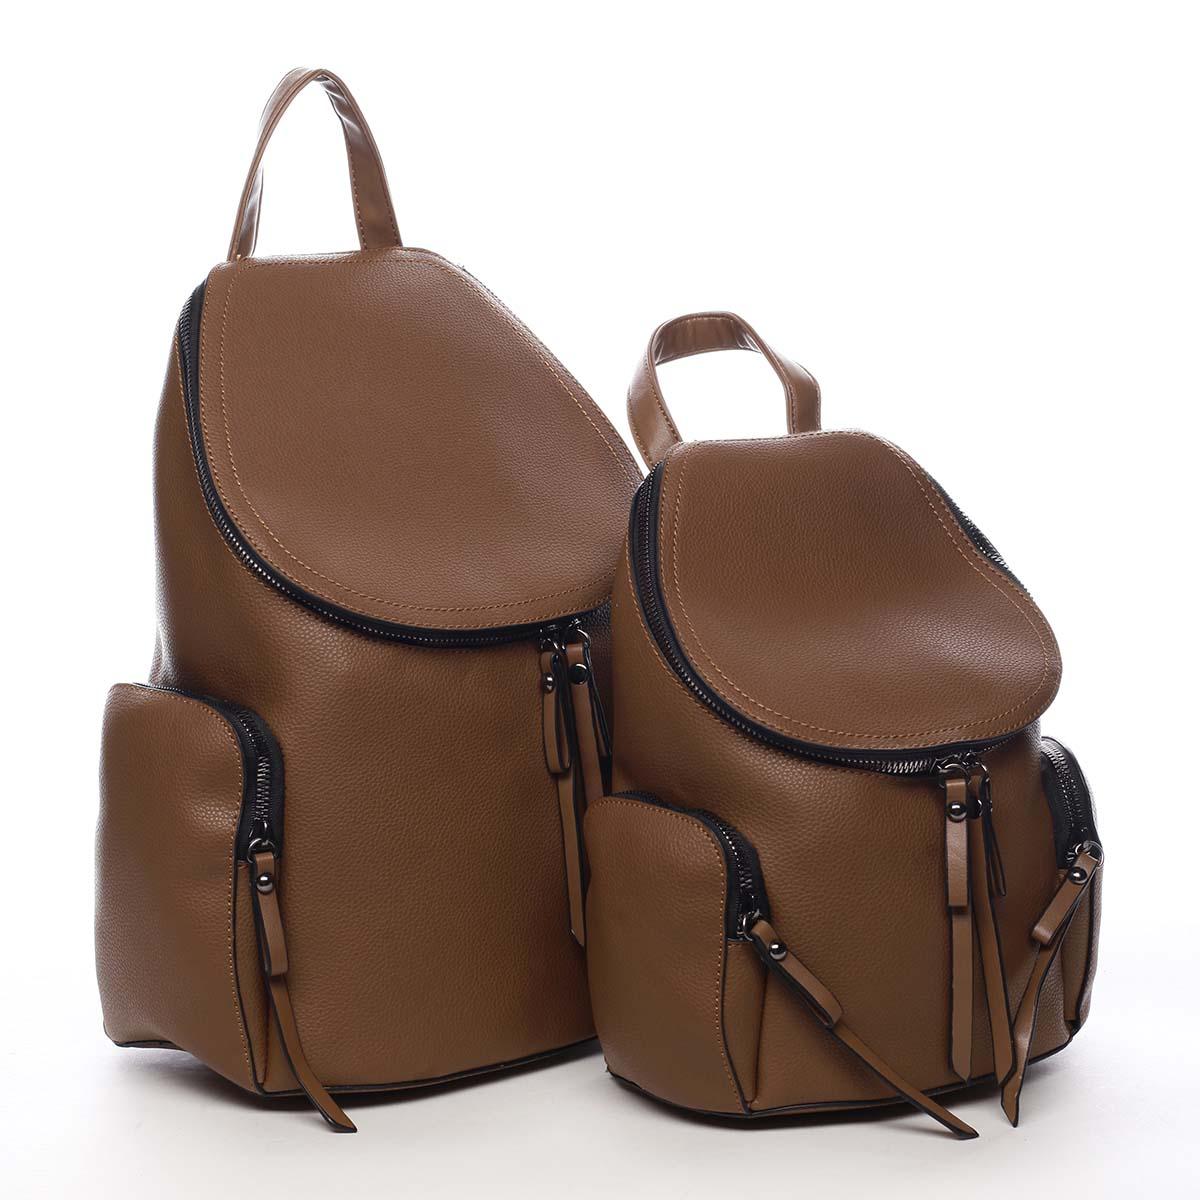 Dámsky batoh hnedý - Maria C Hips Dual